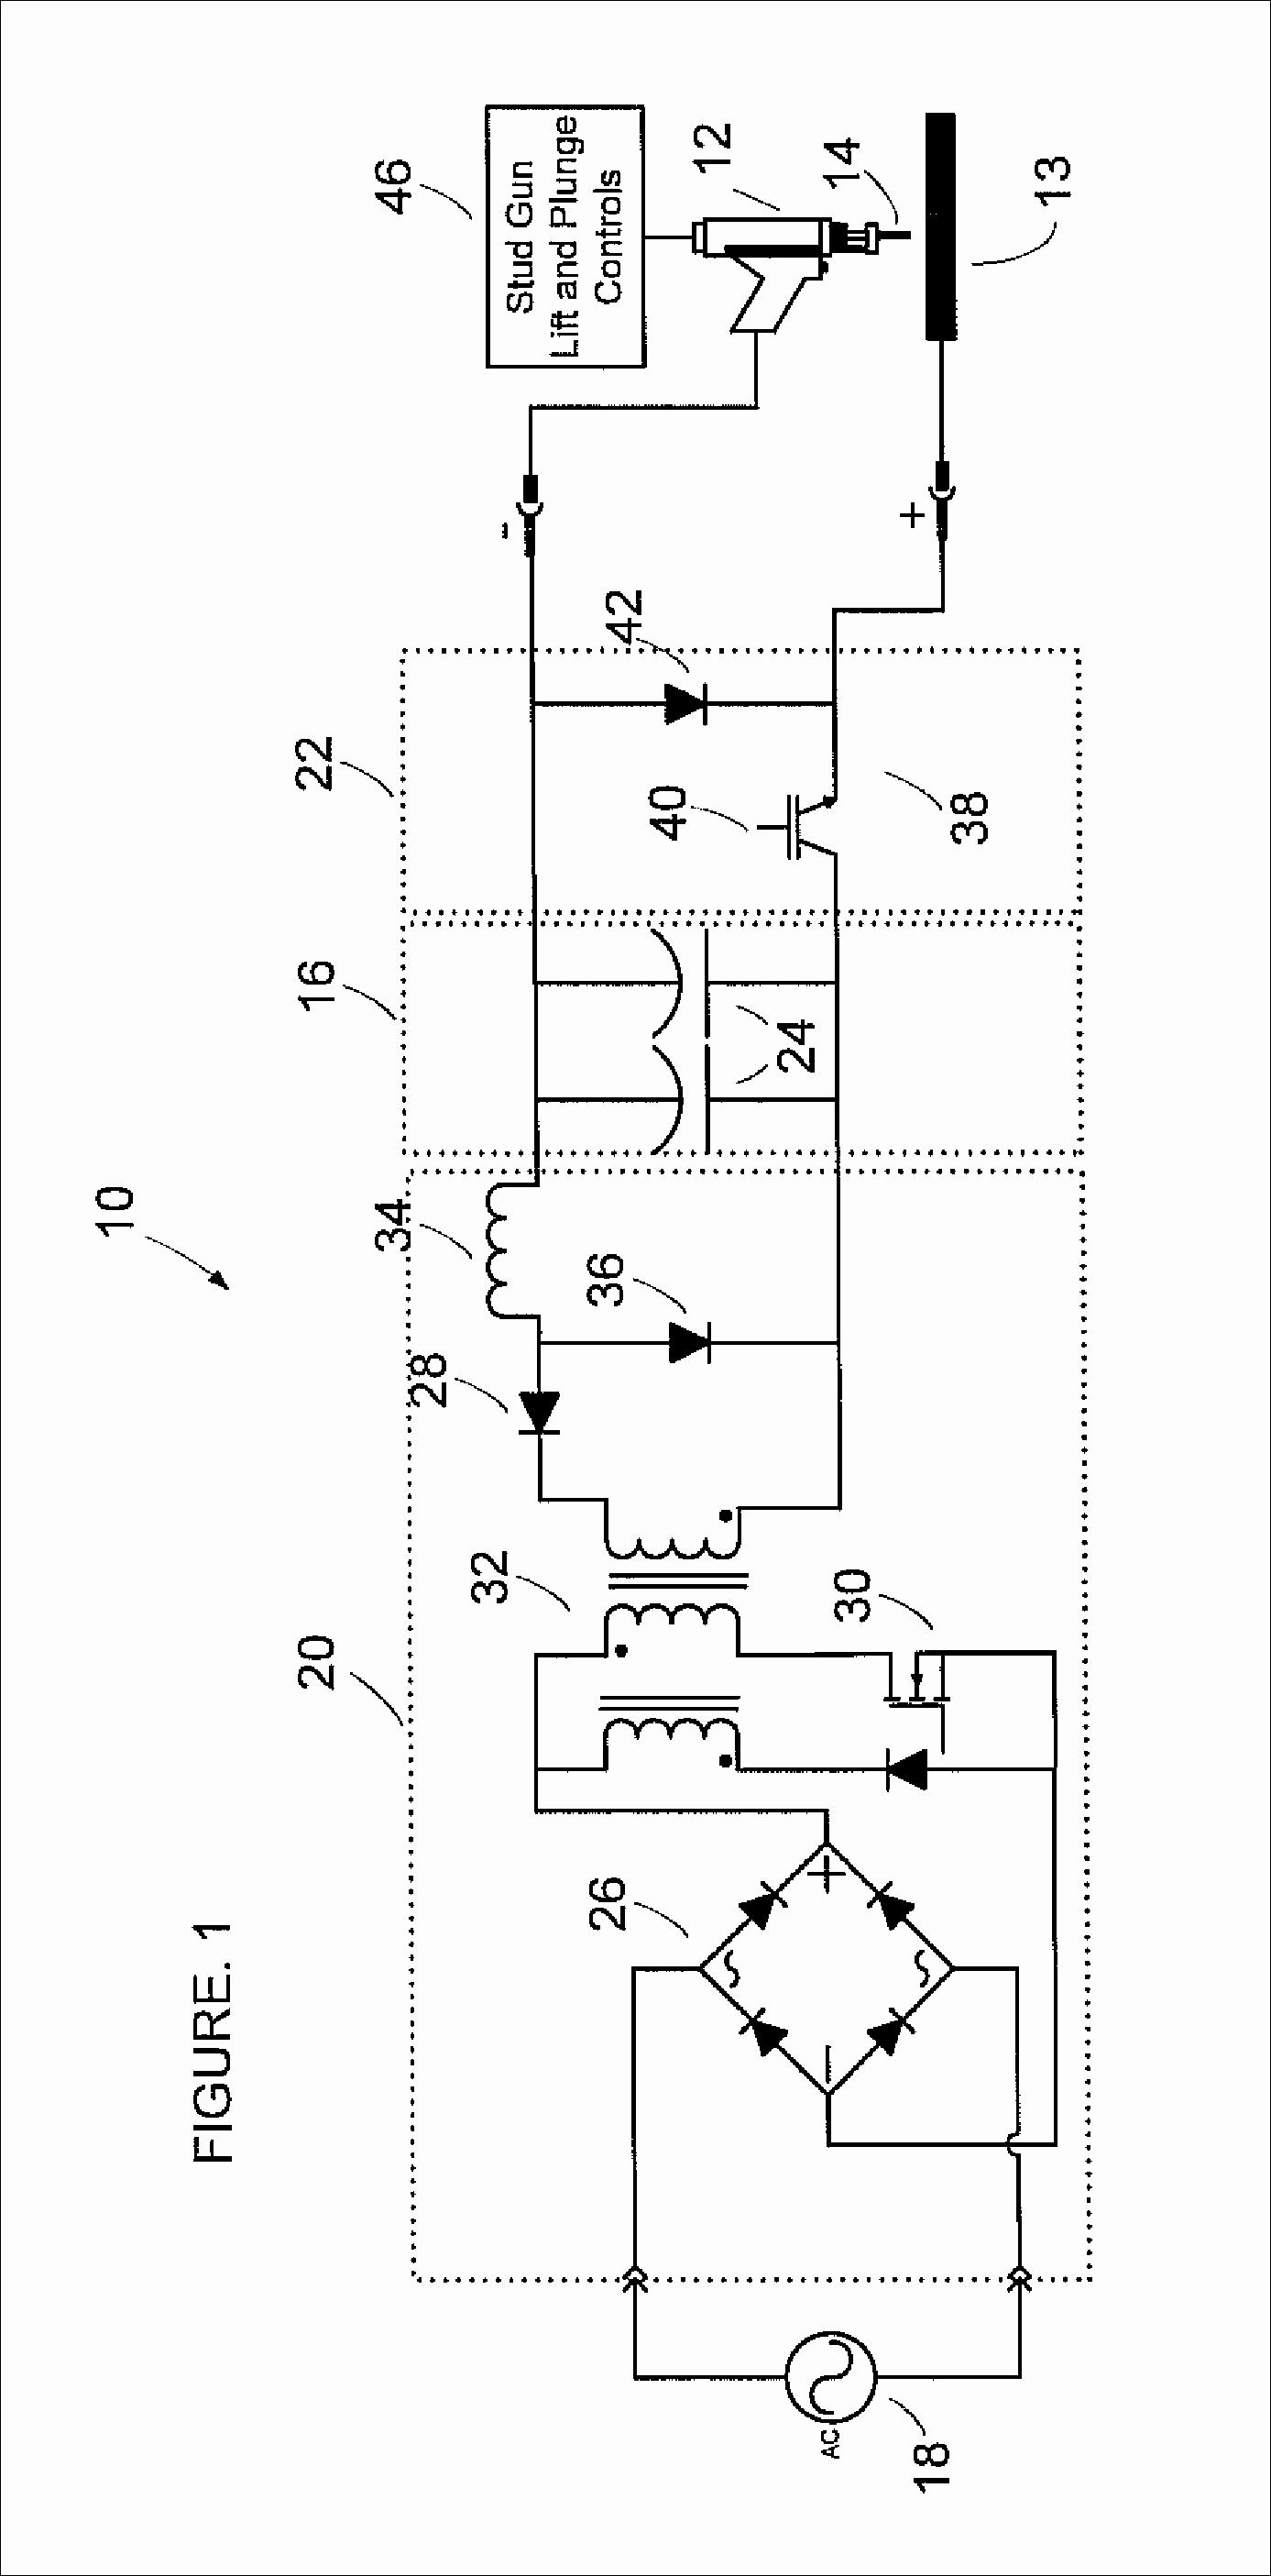 Rc 2944 Lincoln Spool Gun Wiring Diagram Free Diagram